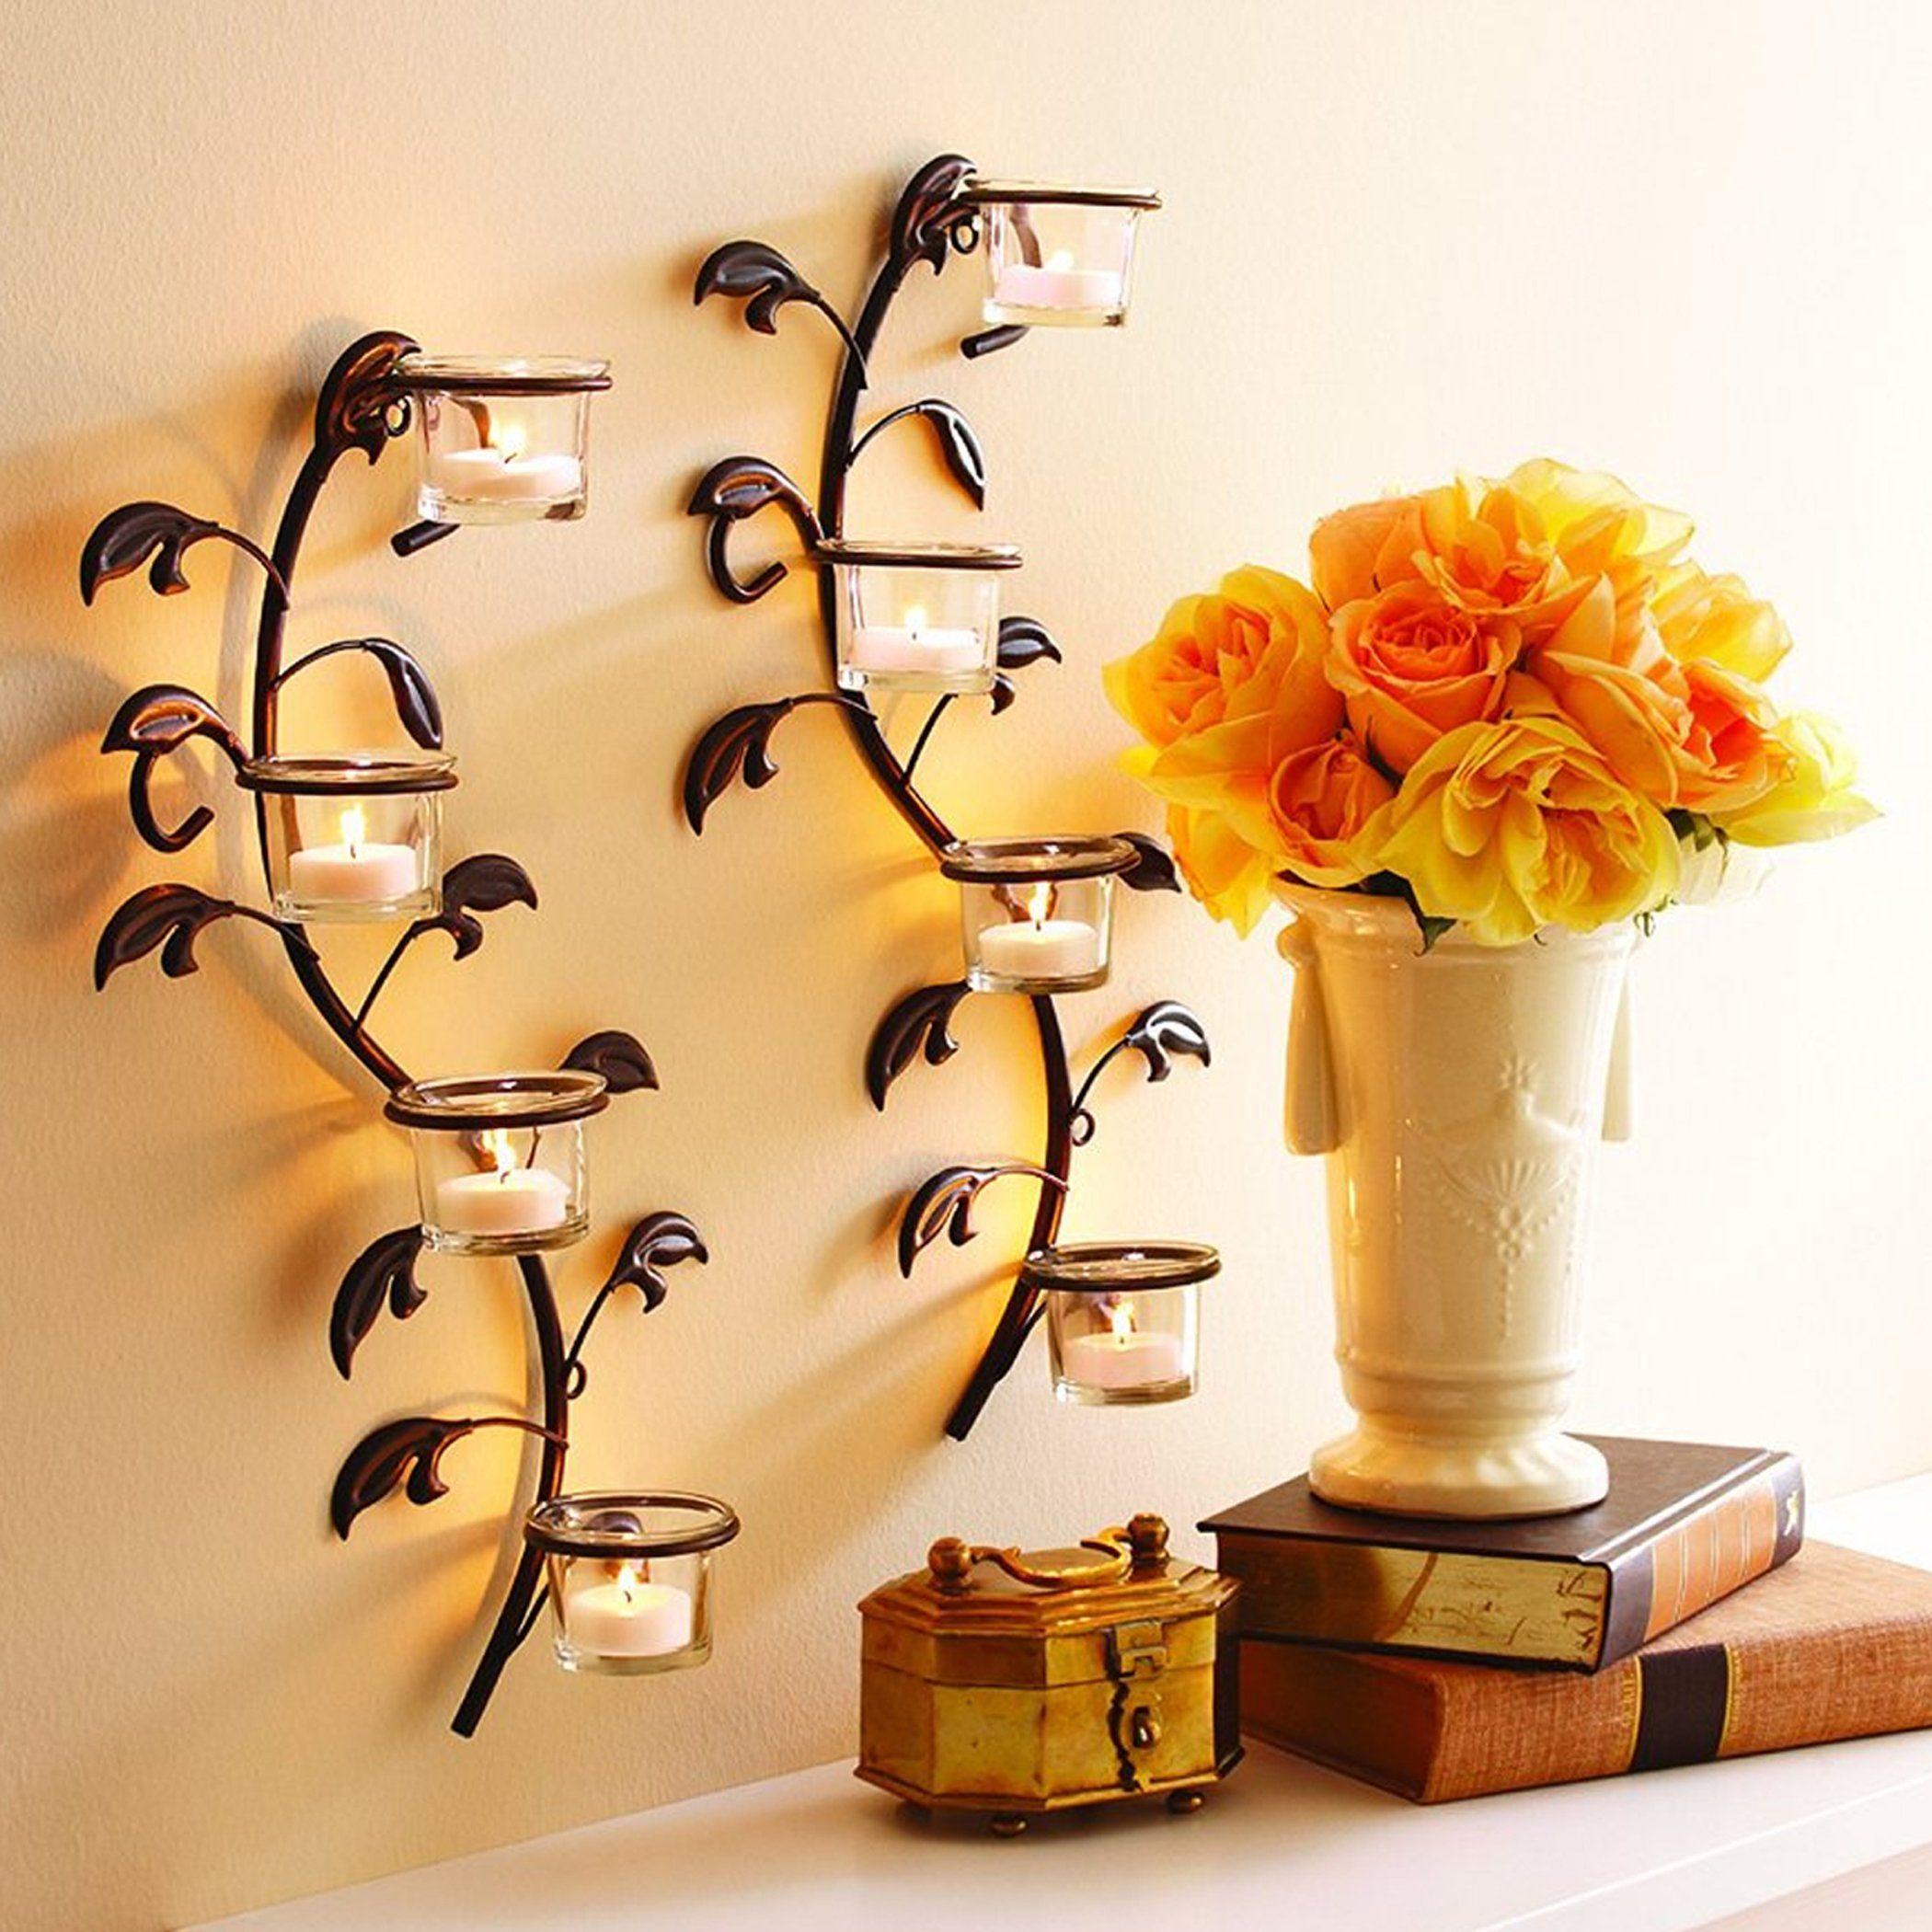 Hosleys Leaf Wall Art Candle Holder Wall Sconce Plaque Set Of 2 Tea Light Holder 16 Hig Wall Candle Holders Iron Wall Candle Holders Candle Holder Wall Sconce